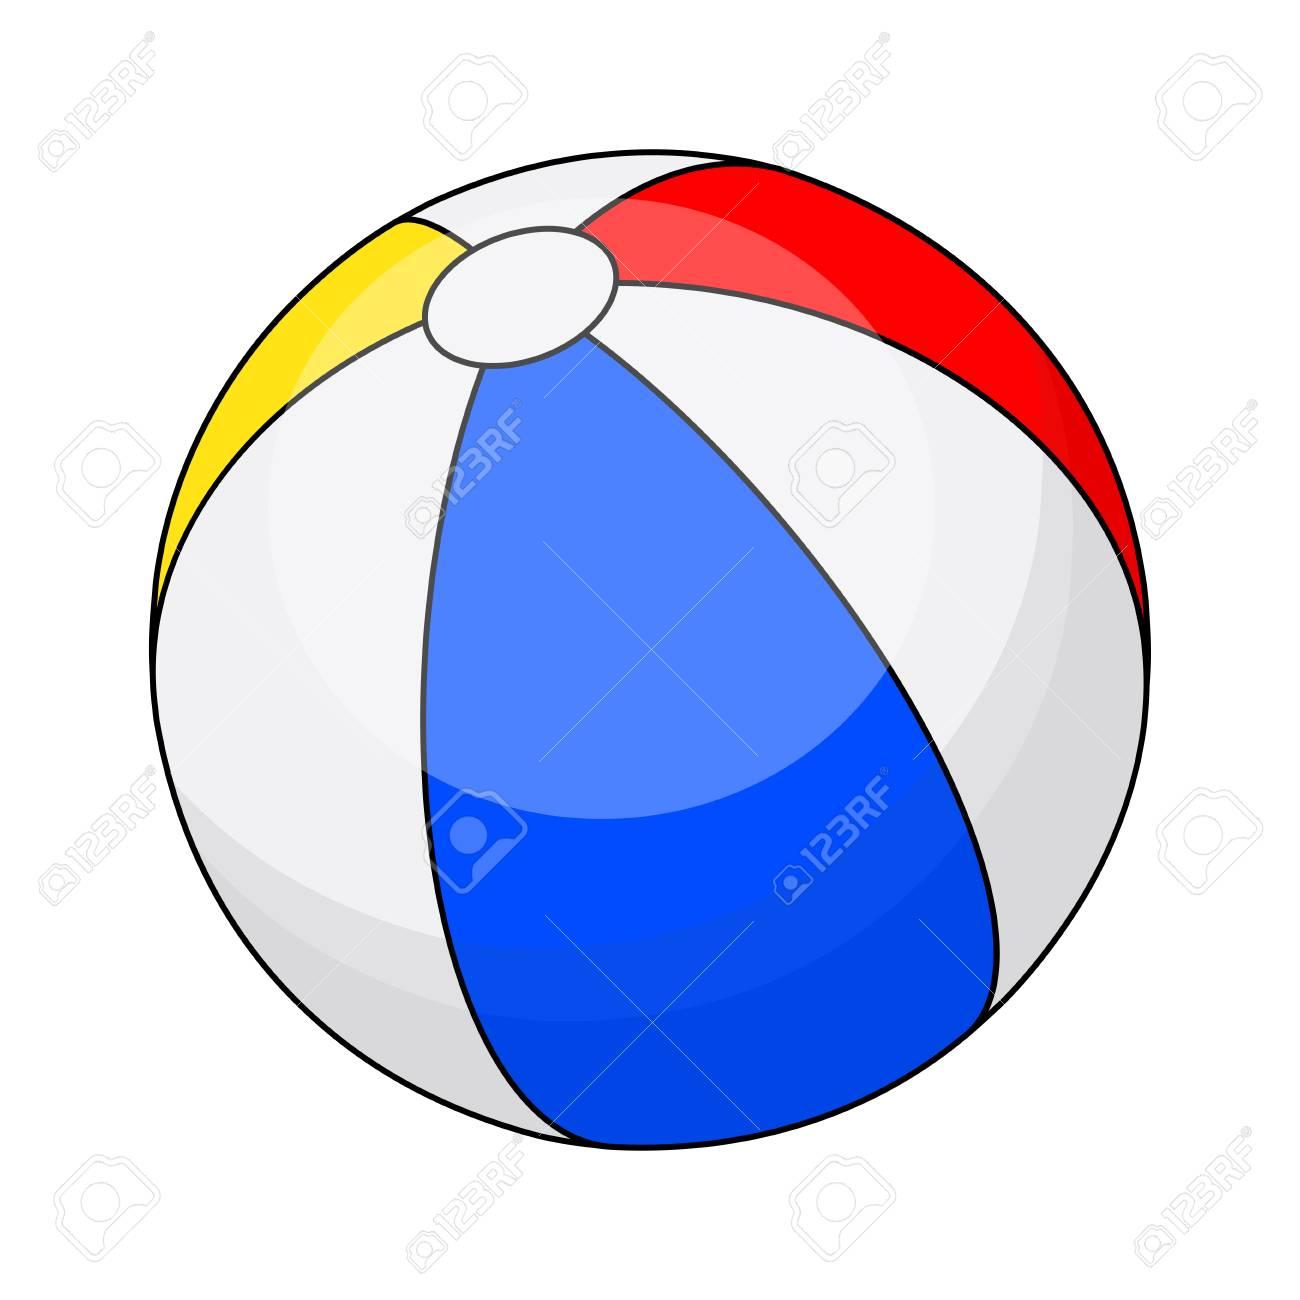 Beachball clipart sphere object. Beach ball rubber free